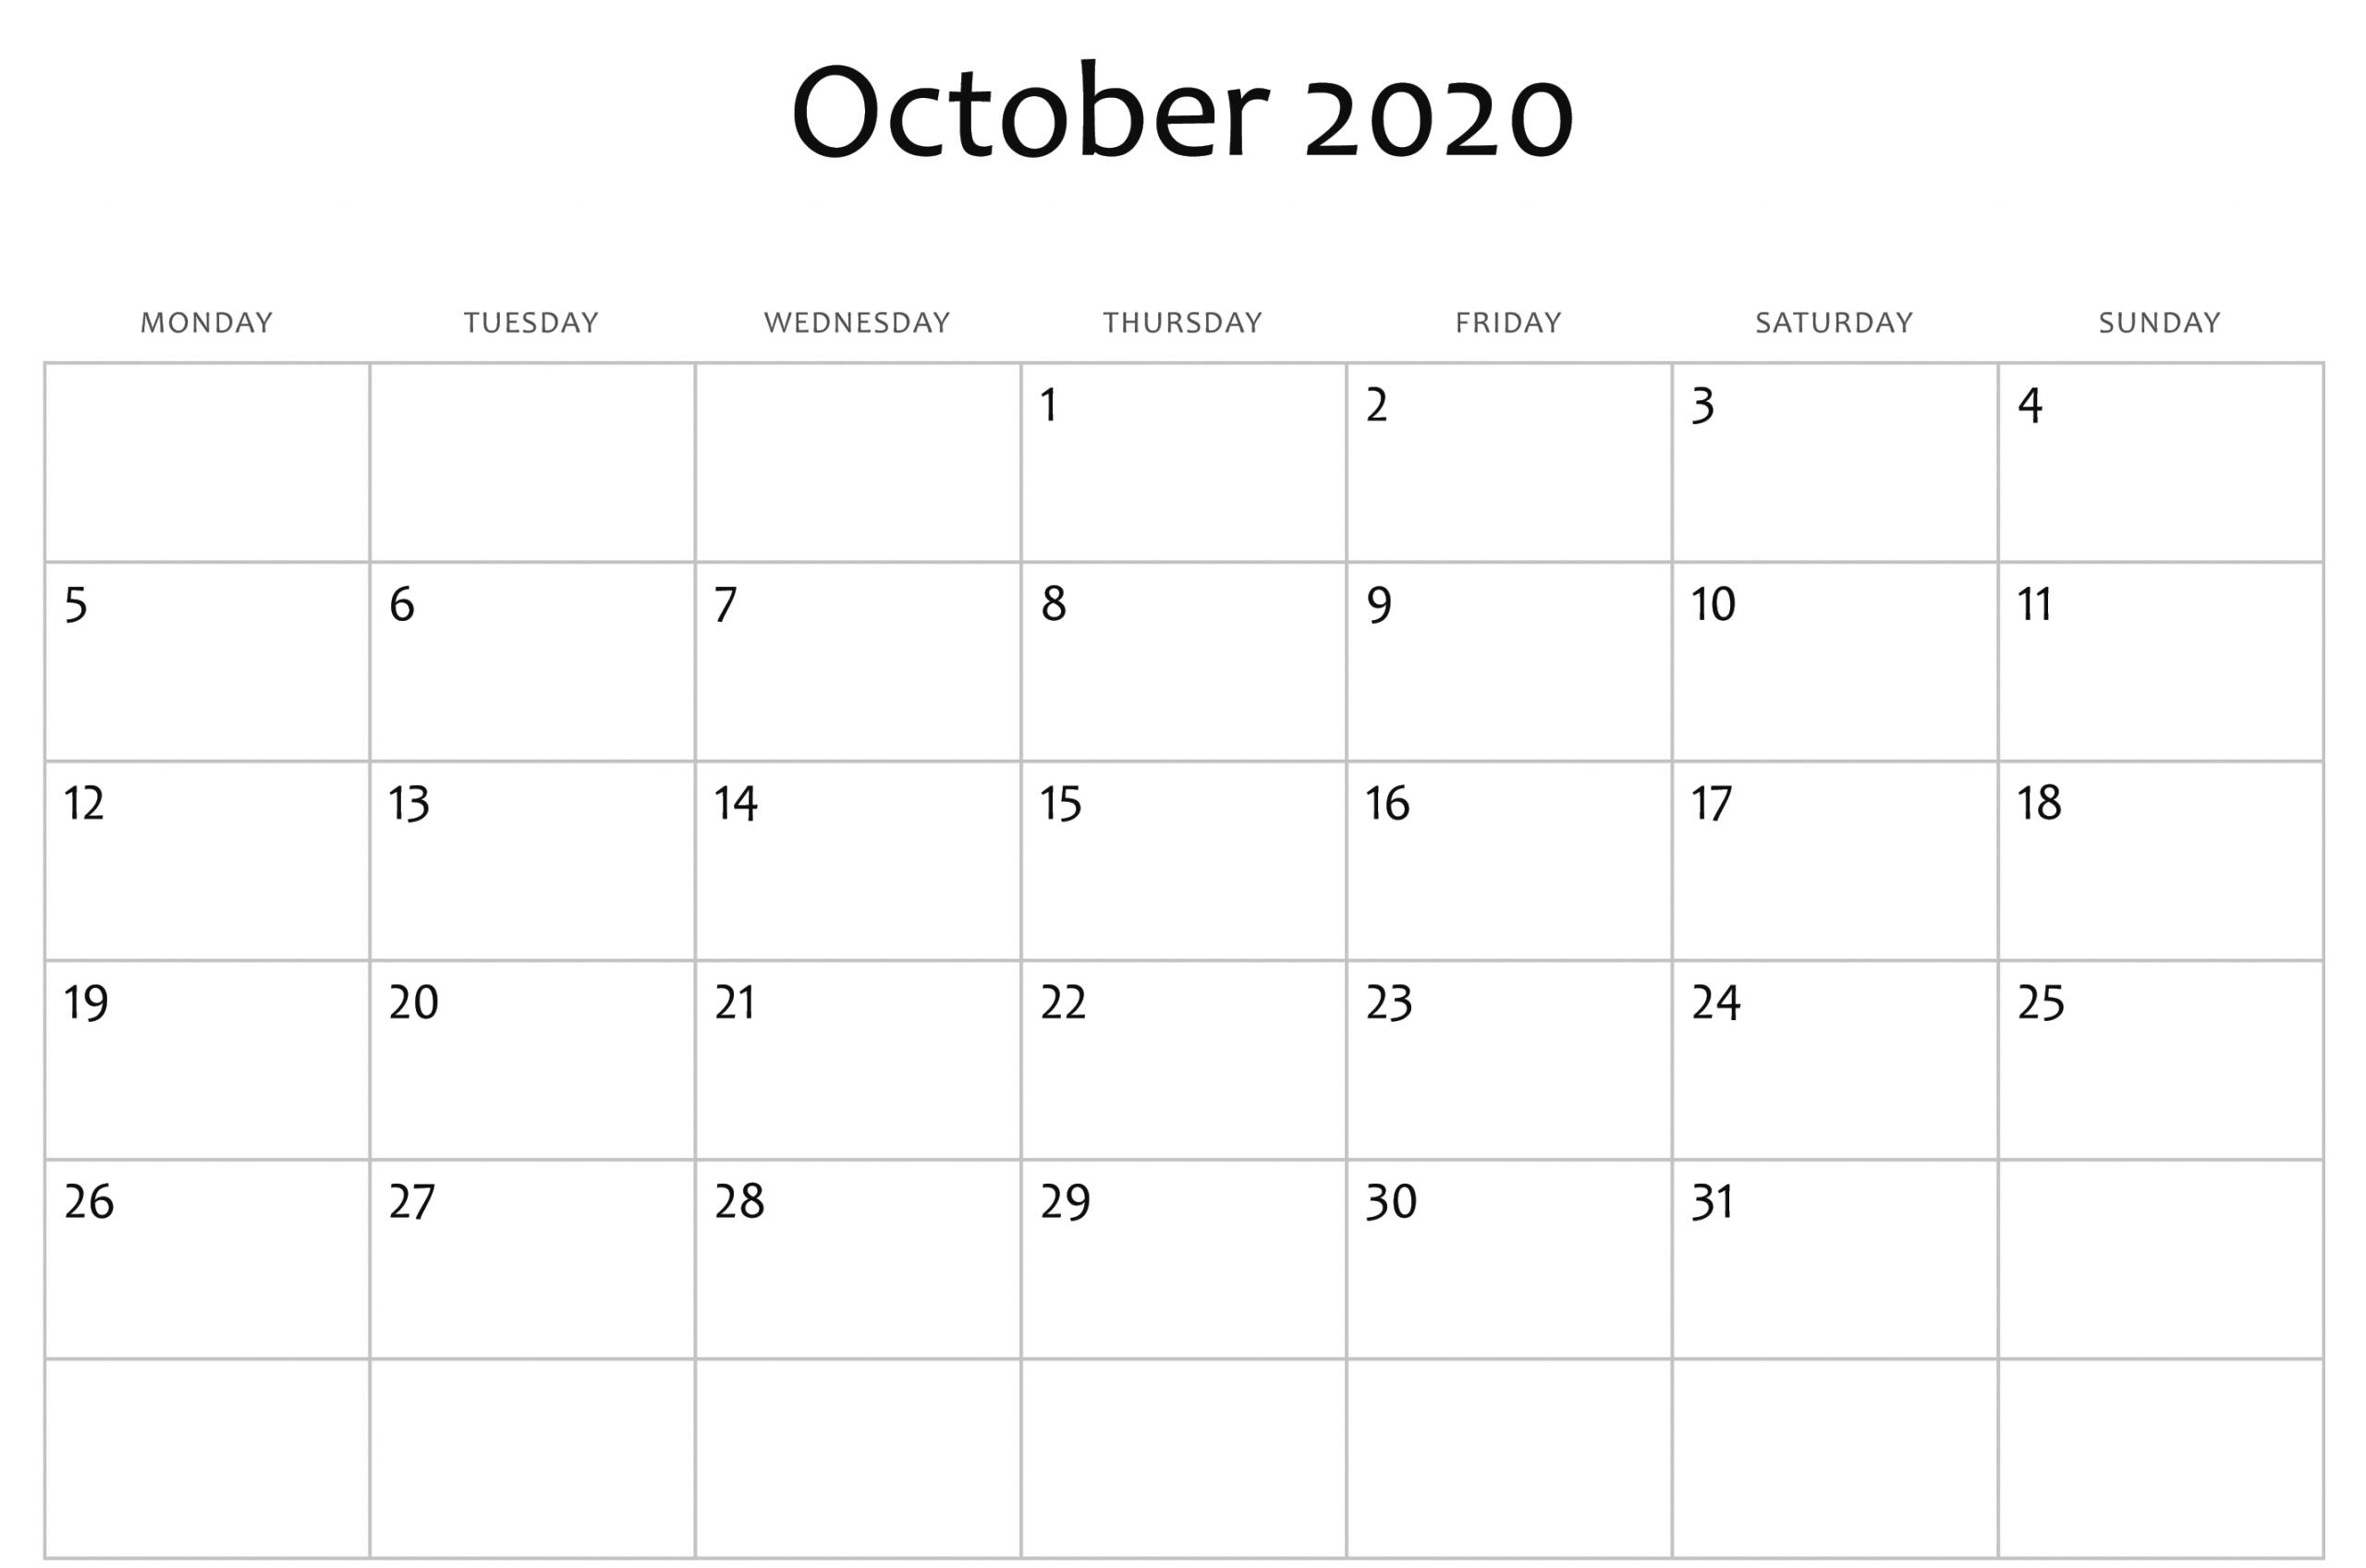 October 2020 Calendar Pdf, Word, Excel Template 3 | October